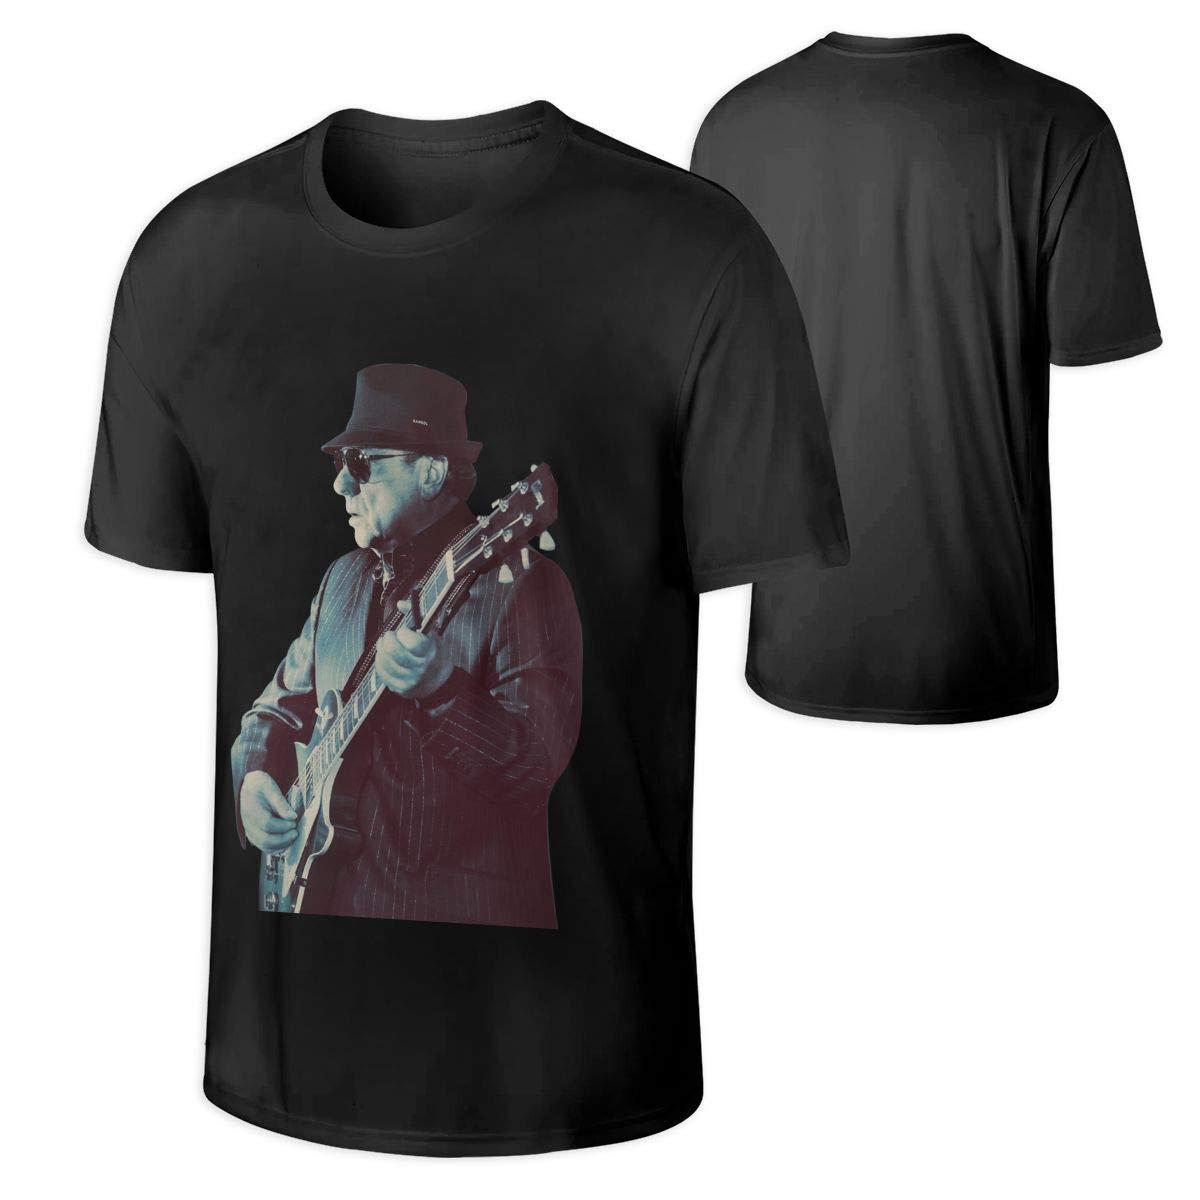 Van Morrison S Black Graphic Tshirt Tee